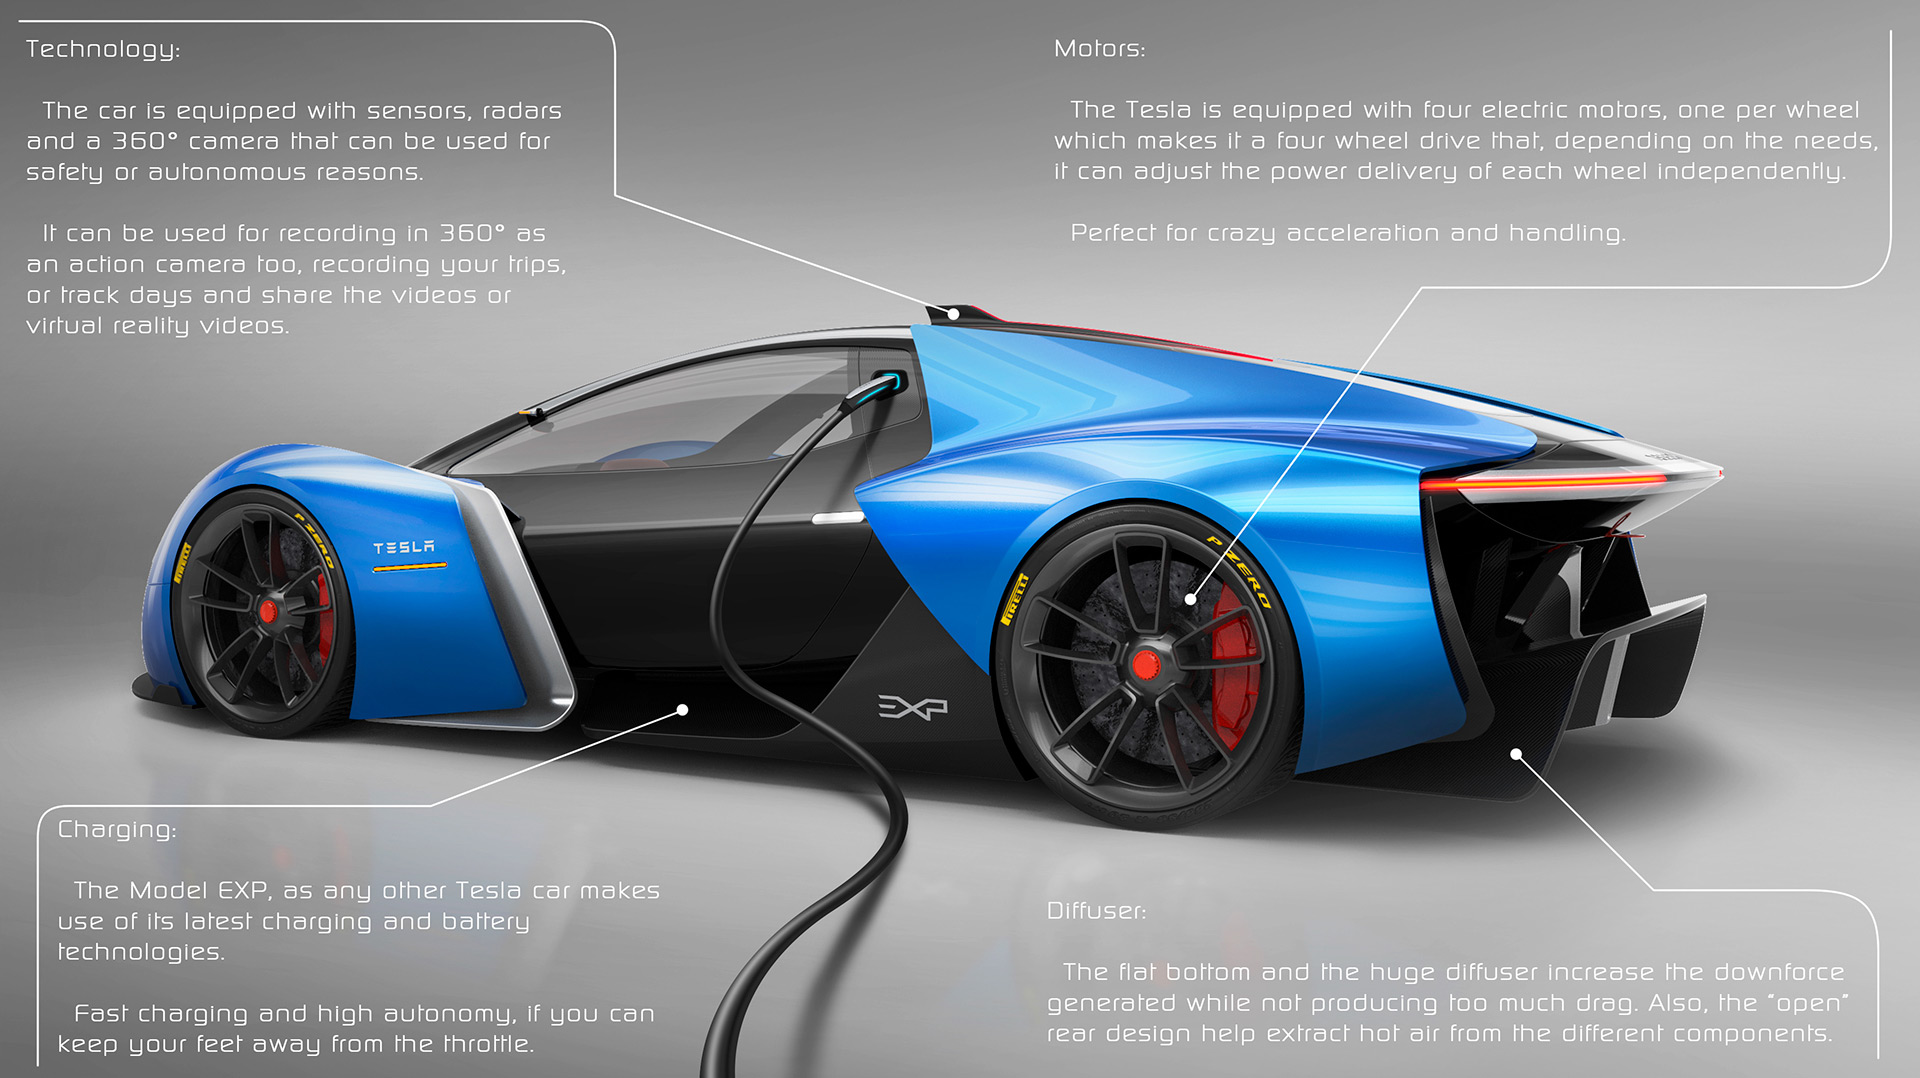 Tesla Model EXP Concept - Technology, Charging, Rear Diffuser, Motors